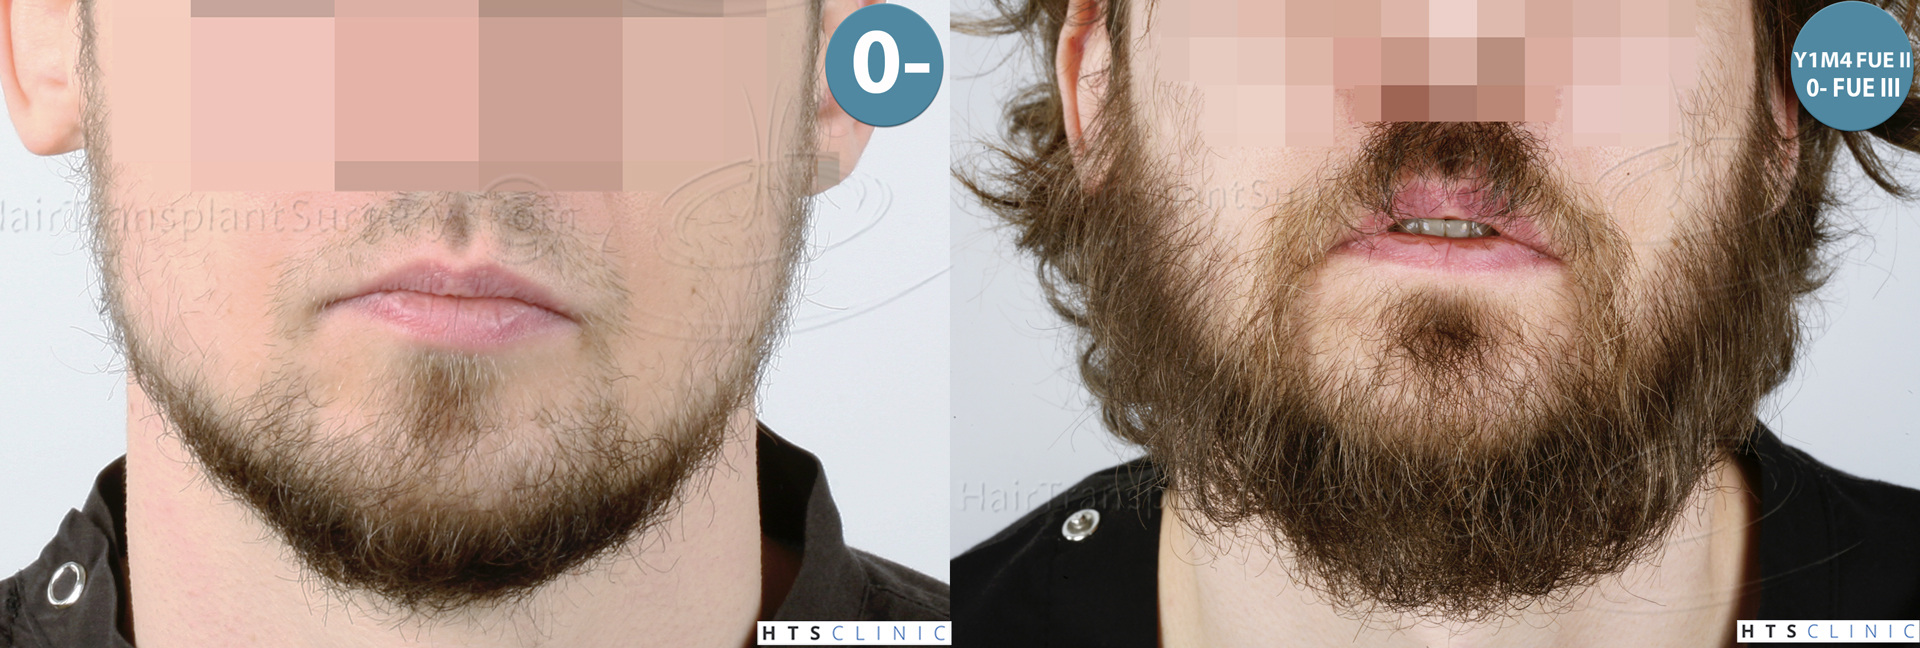 Dr.Devroye-HTS-Clinic-6132-_2011_1232_2889_-FUE-Barbe-et-cheveux-Montage1.jpg